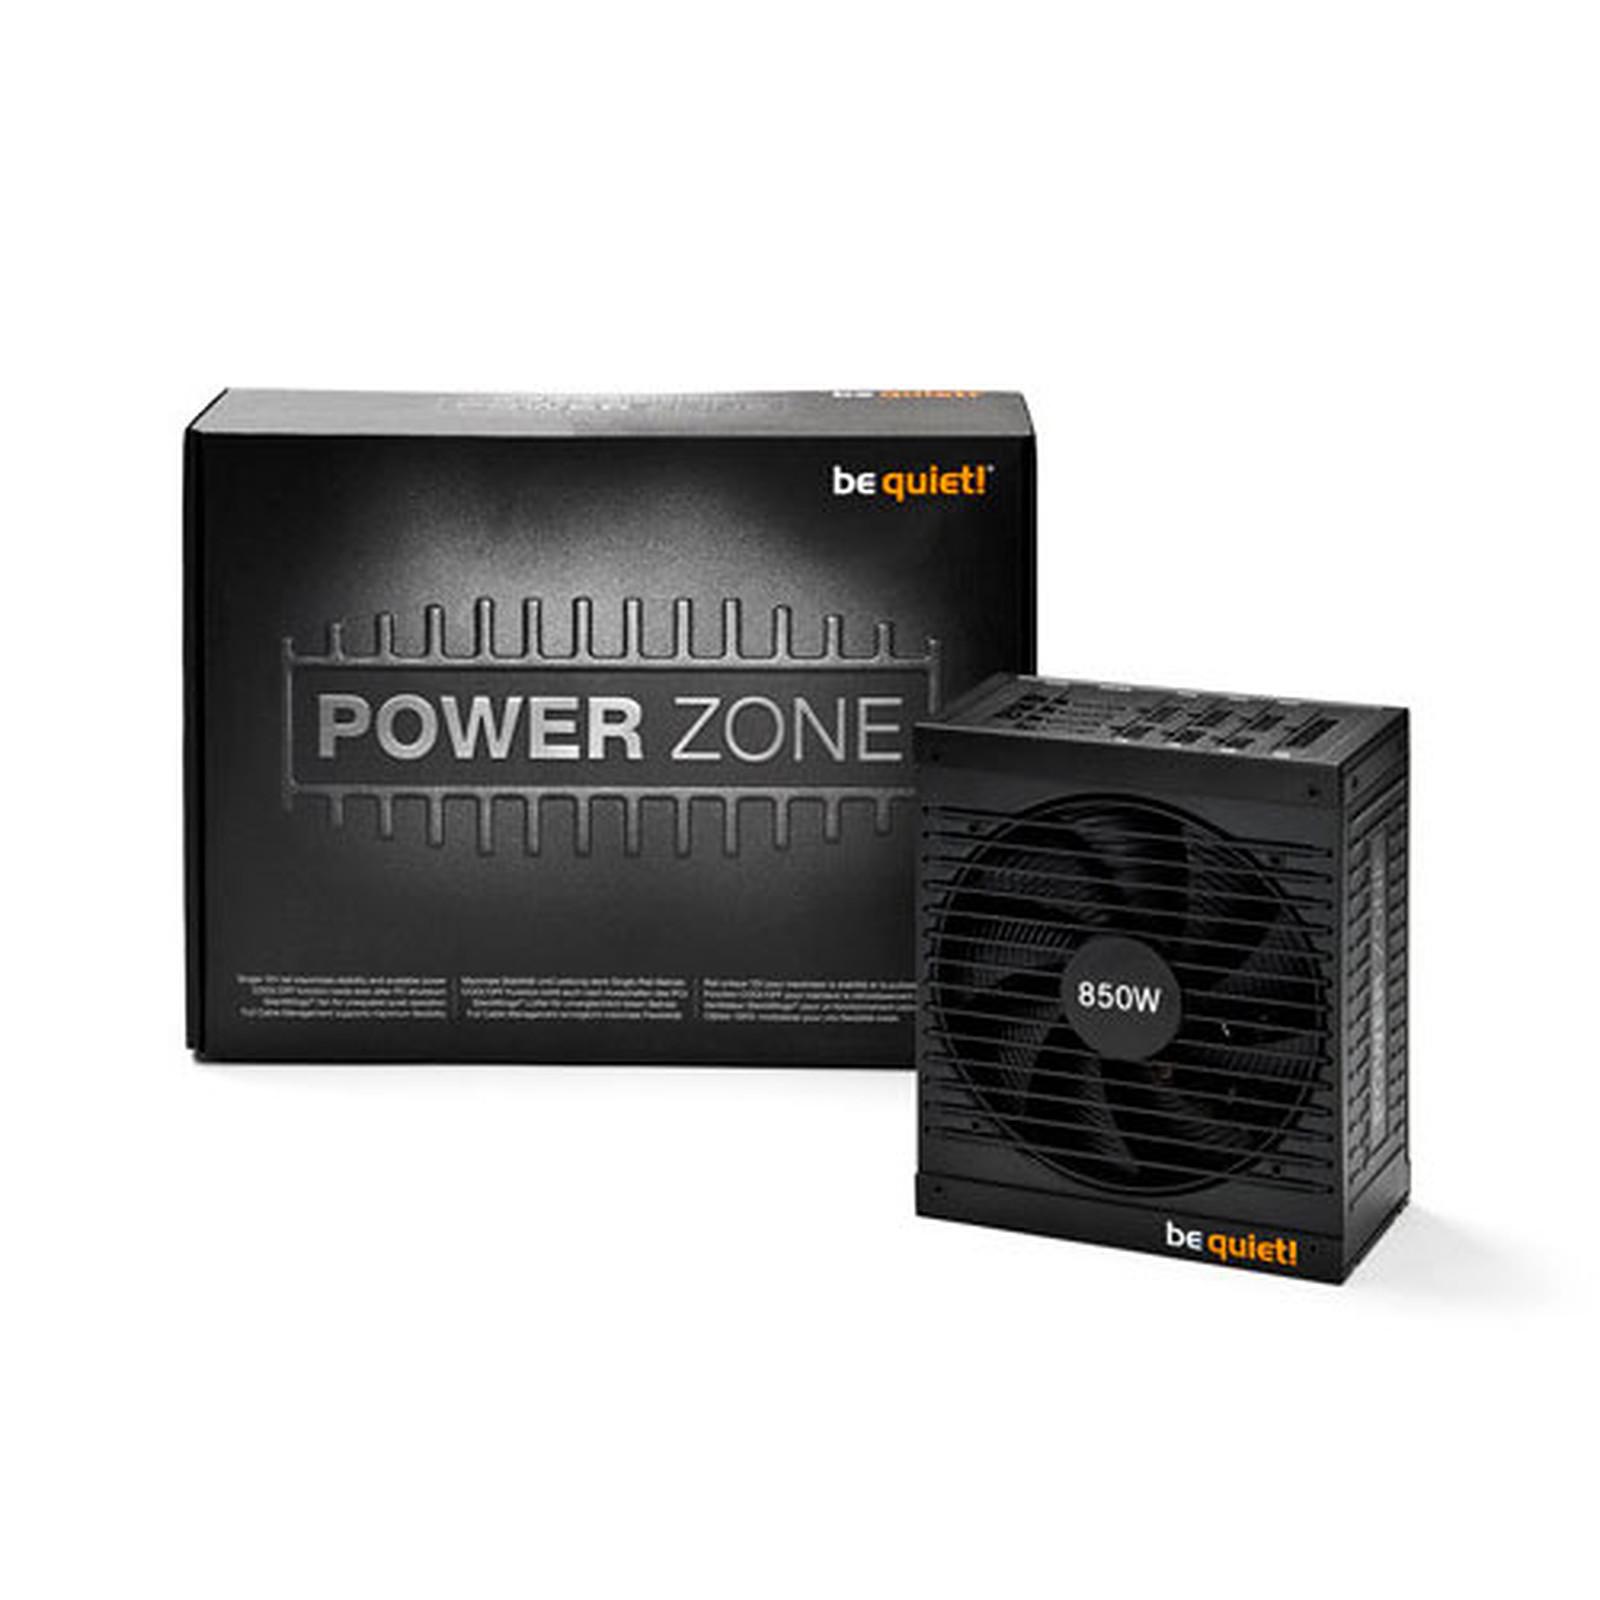 be quiet! Power Zone 850W 80PLUS Bronce